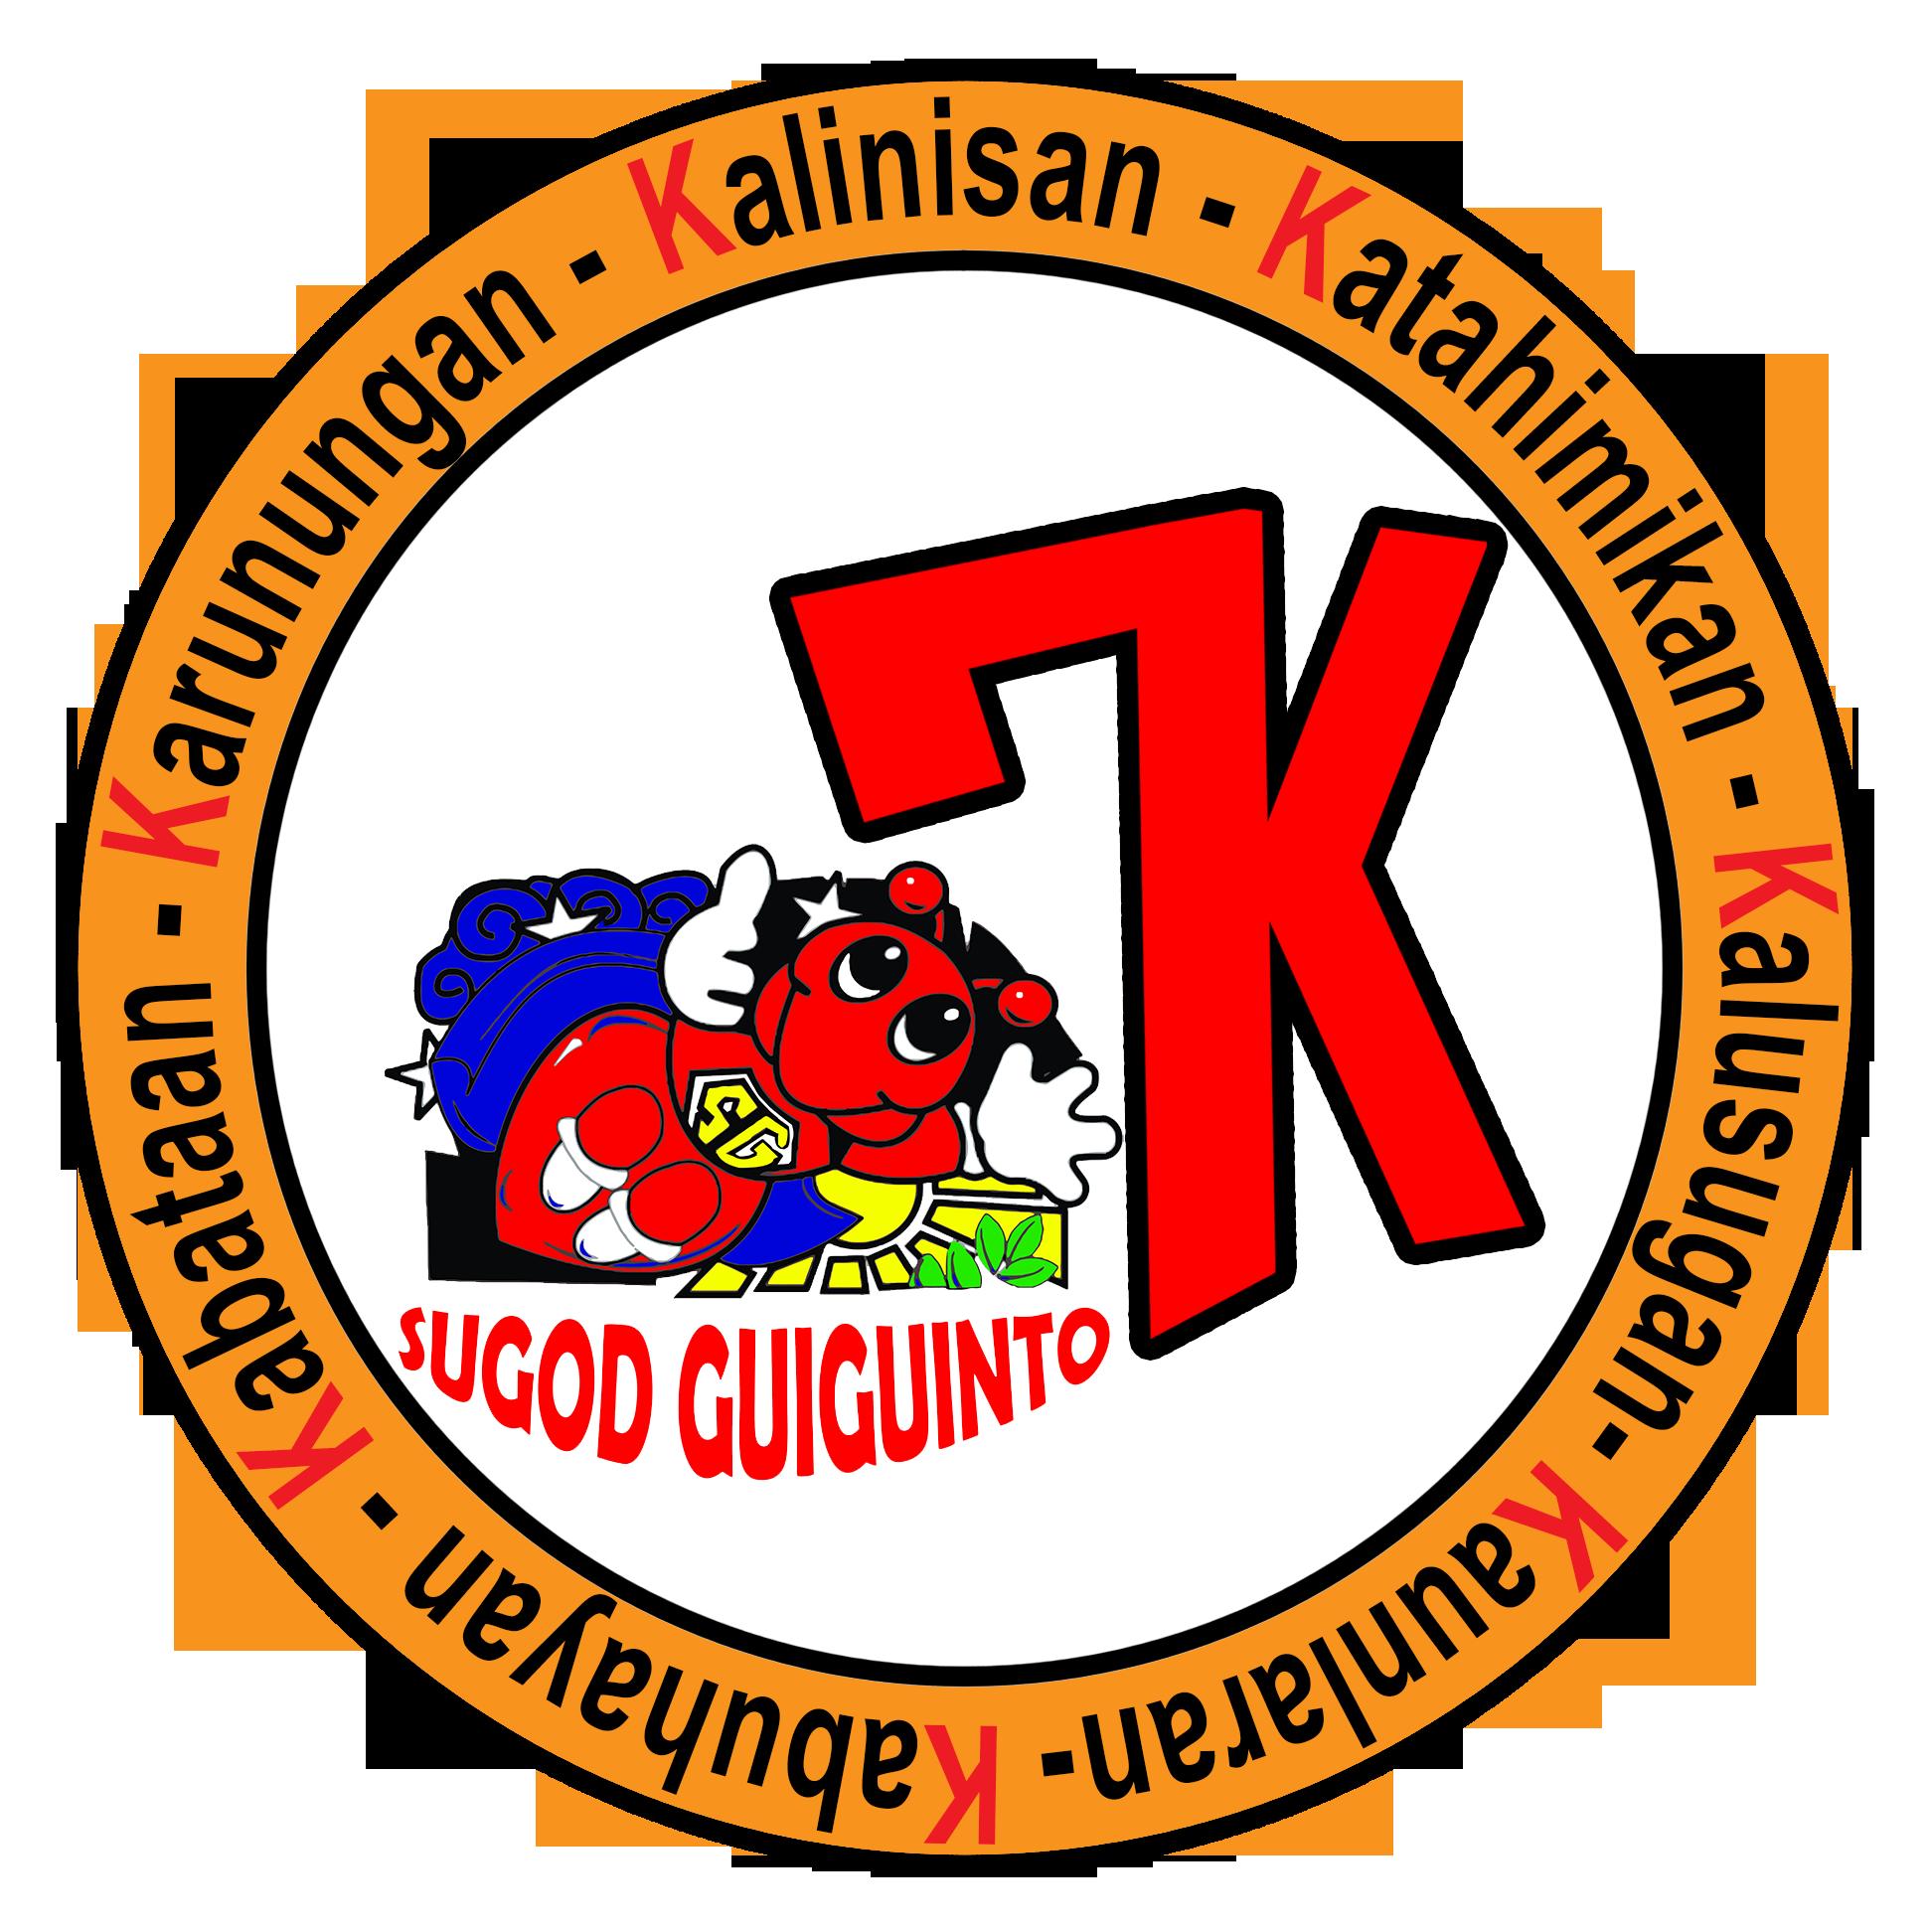 7k logo clear